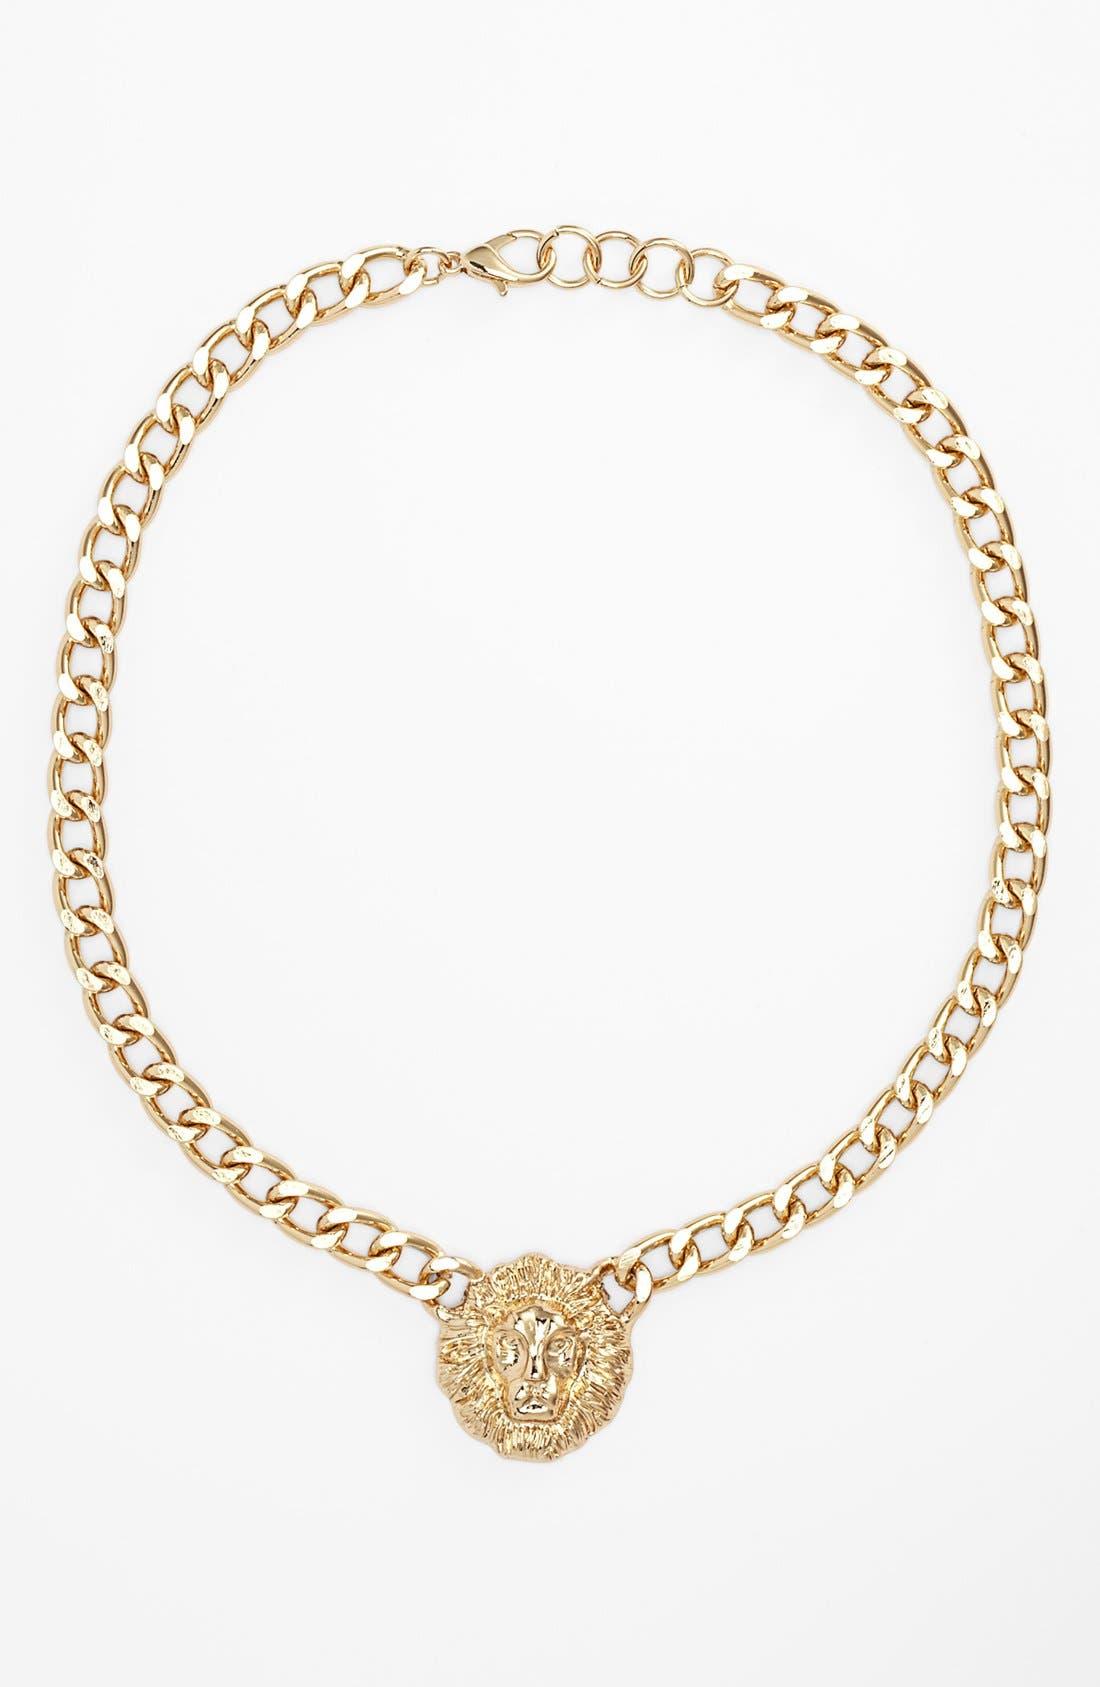 Alternate Image 1 Selected - BP. 'Lion' Chain Necklace (Juniors)